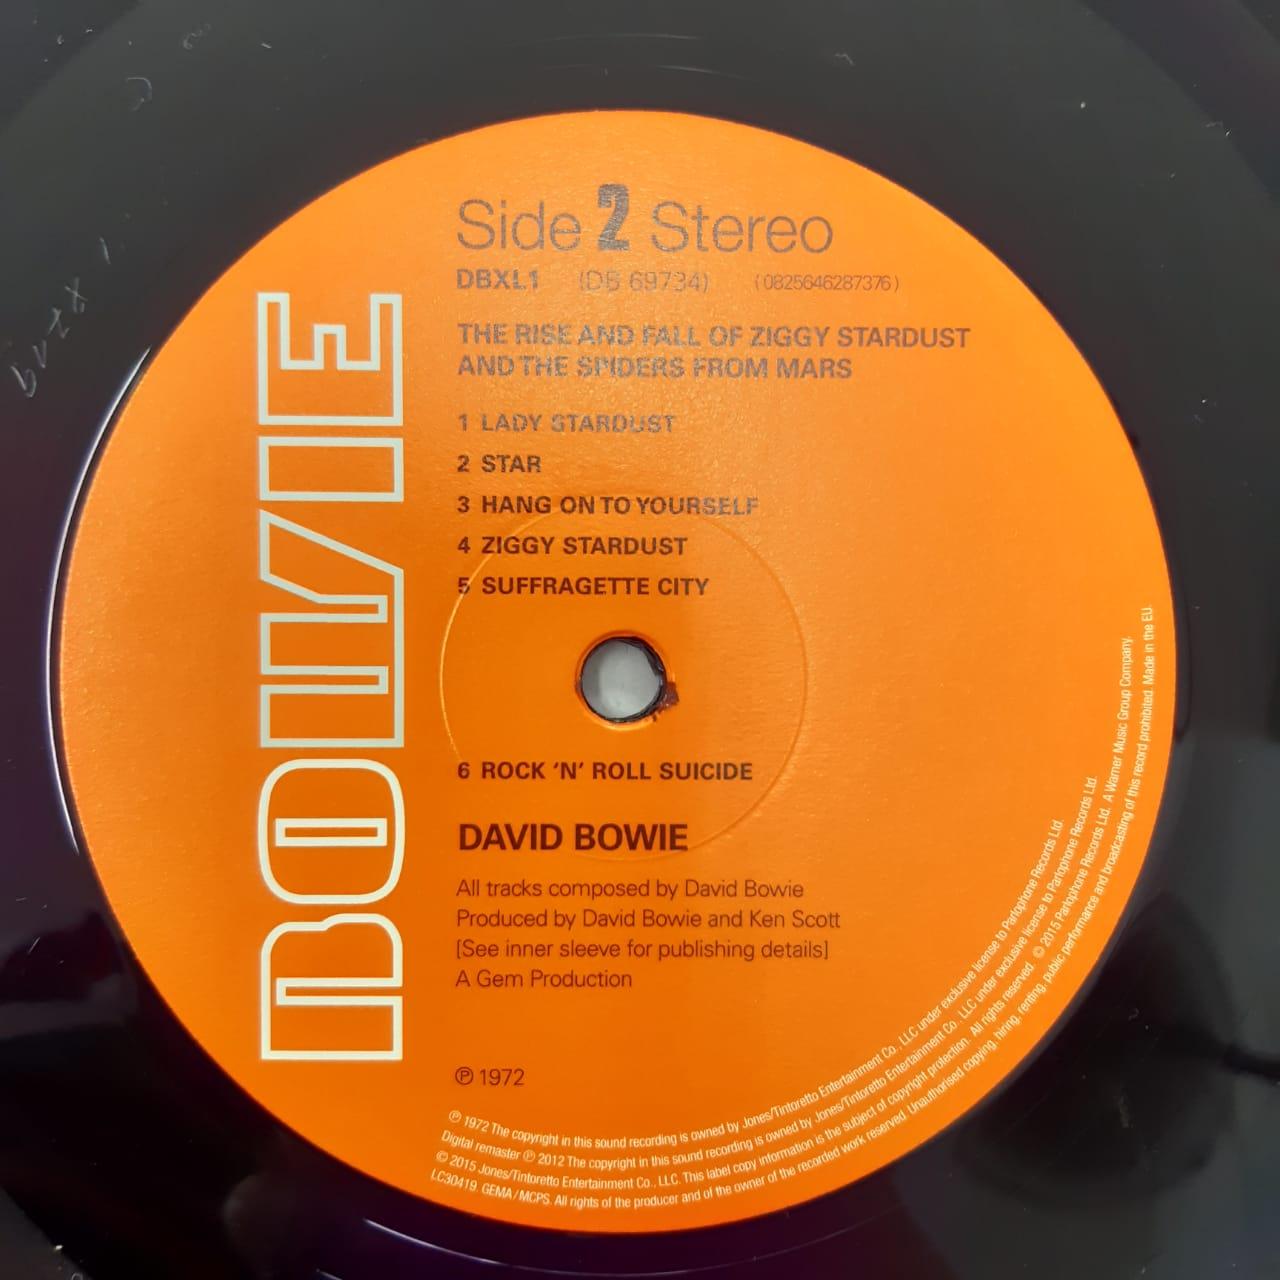 Lp Vinil David Bowie Ziggy Stardust